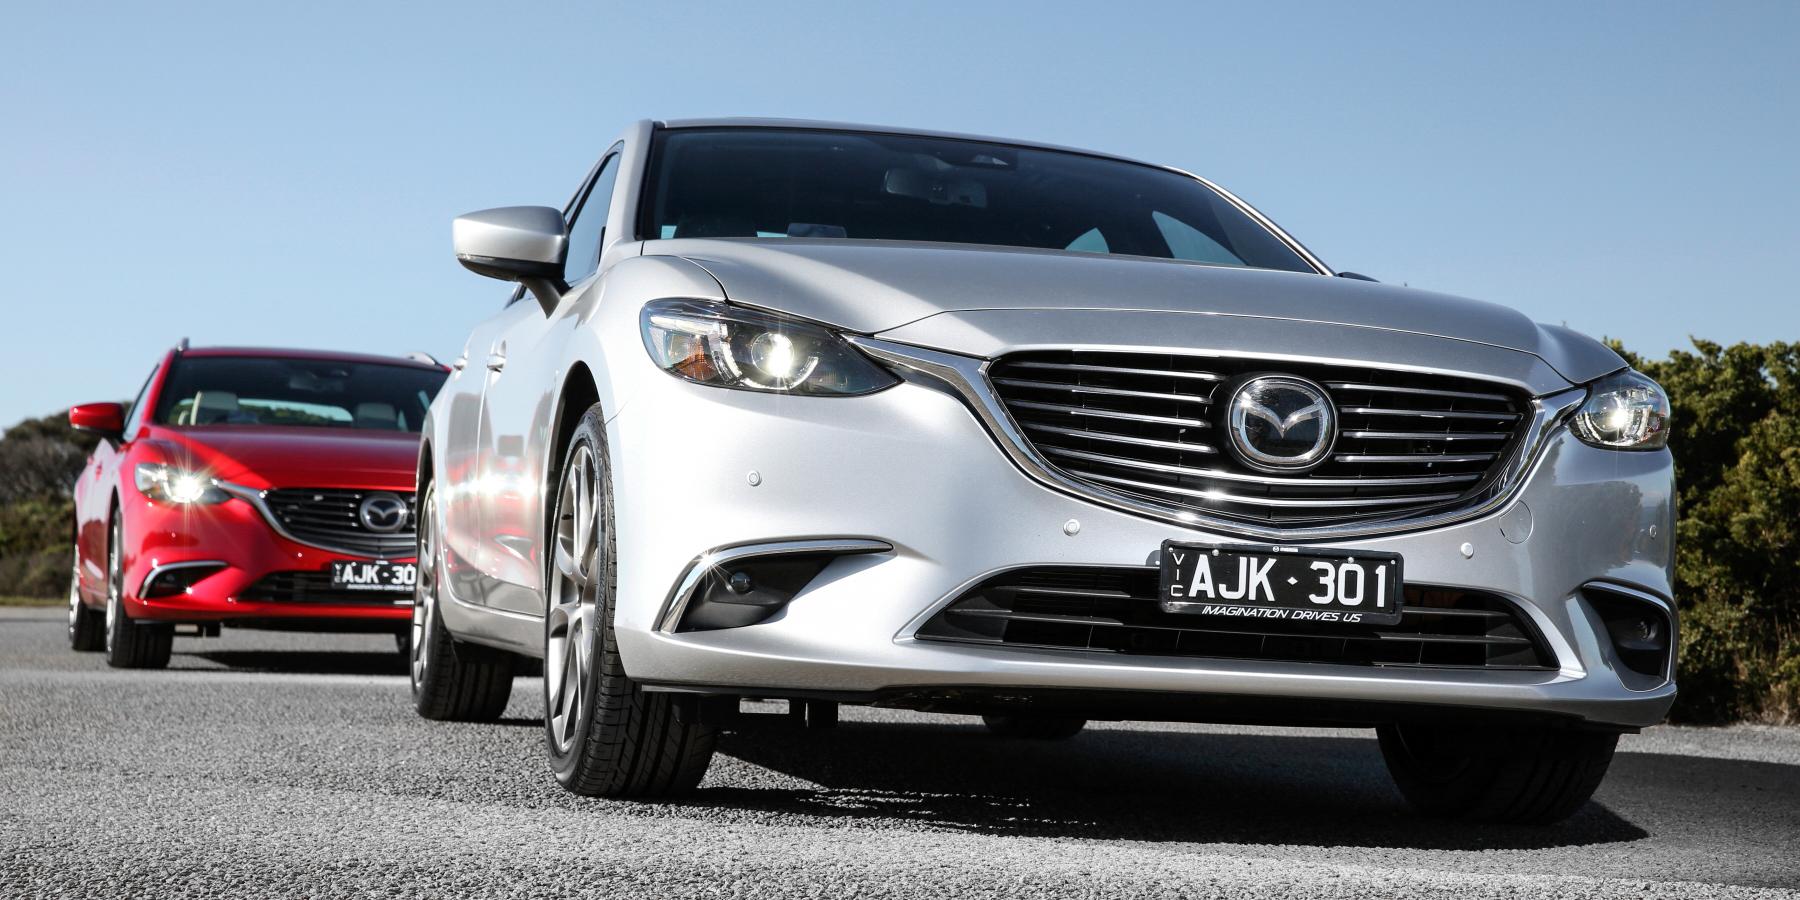 Fantastic 2017 Mazda 6 Review  CarAdvice